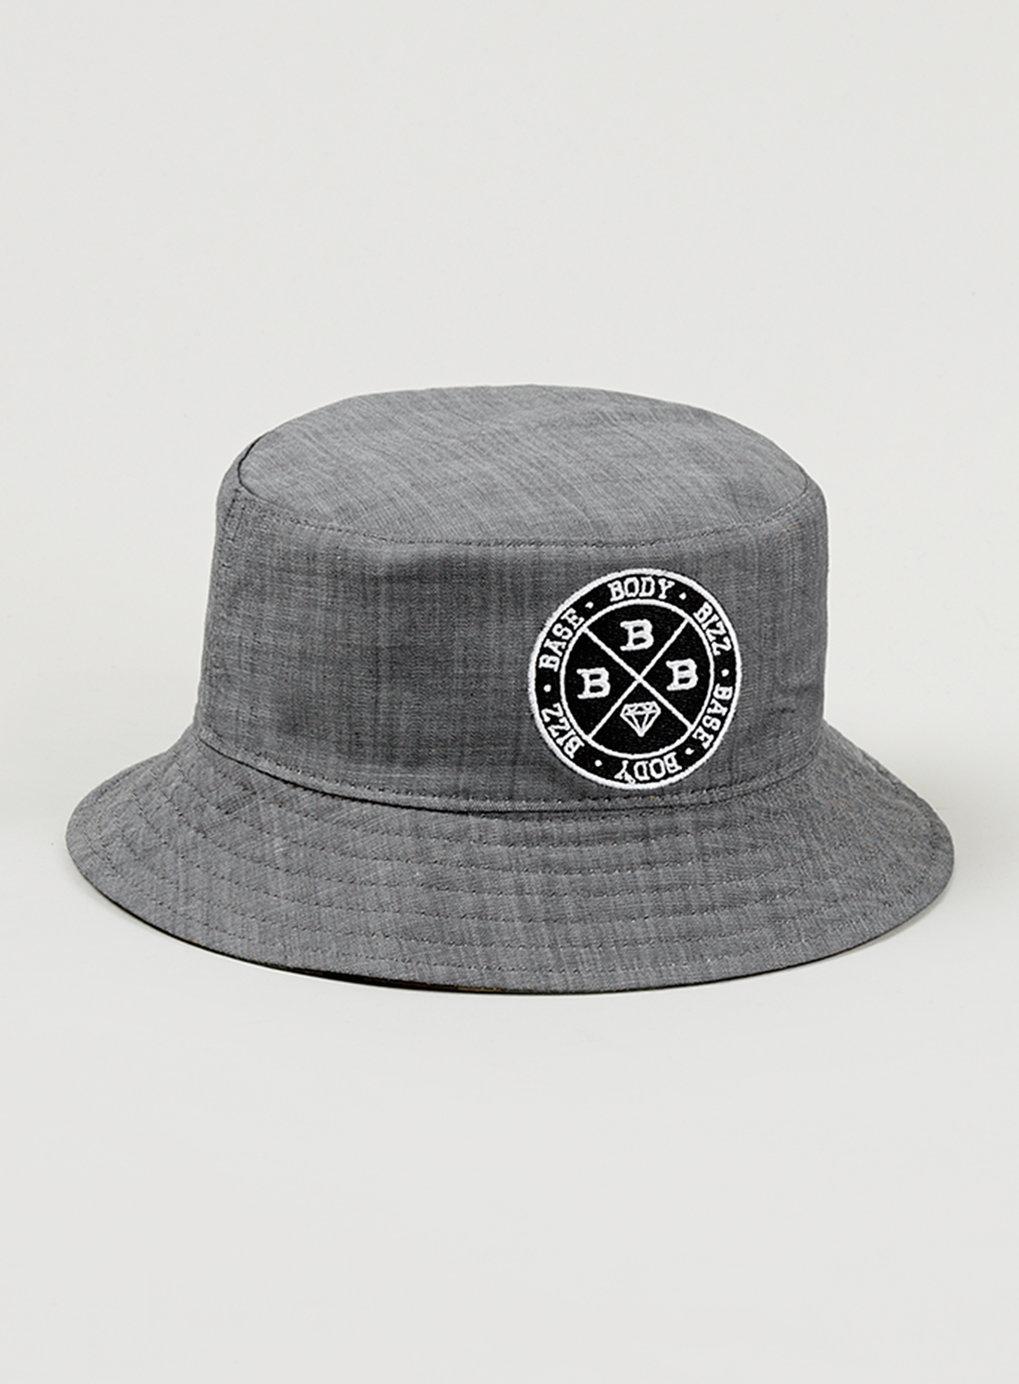 ffbafb1fdf2cf8 Lyst - TOPMAN Jamal Edwards Grey Chambray Reversible Bucket Hat for Men